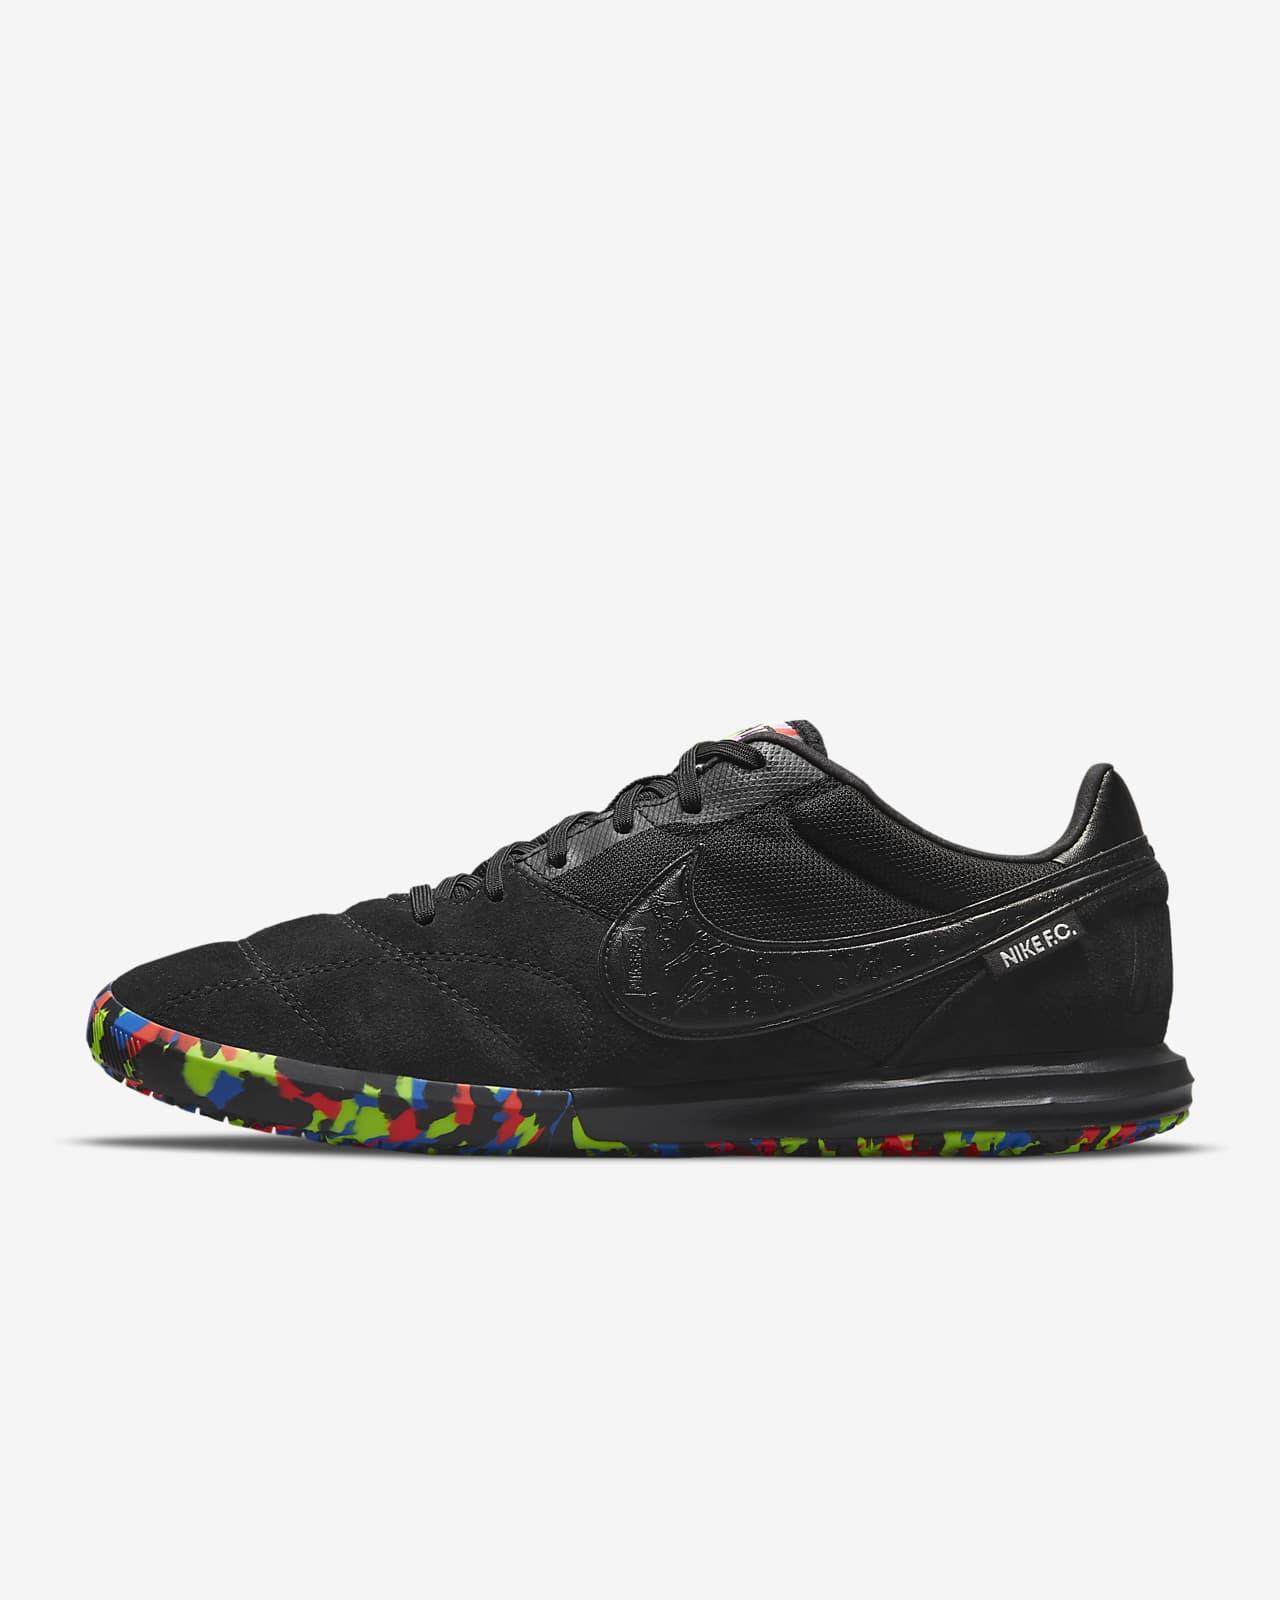 Nike Premier 2 Sala IC Indoor/Court Soccer Shoe